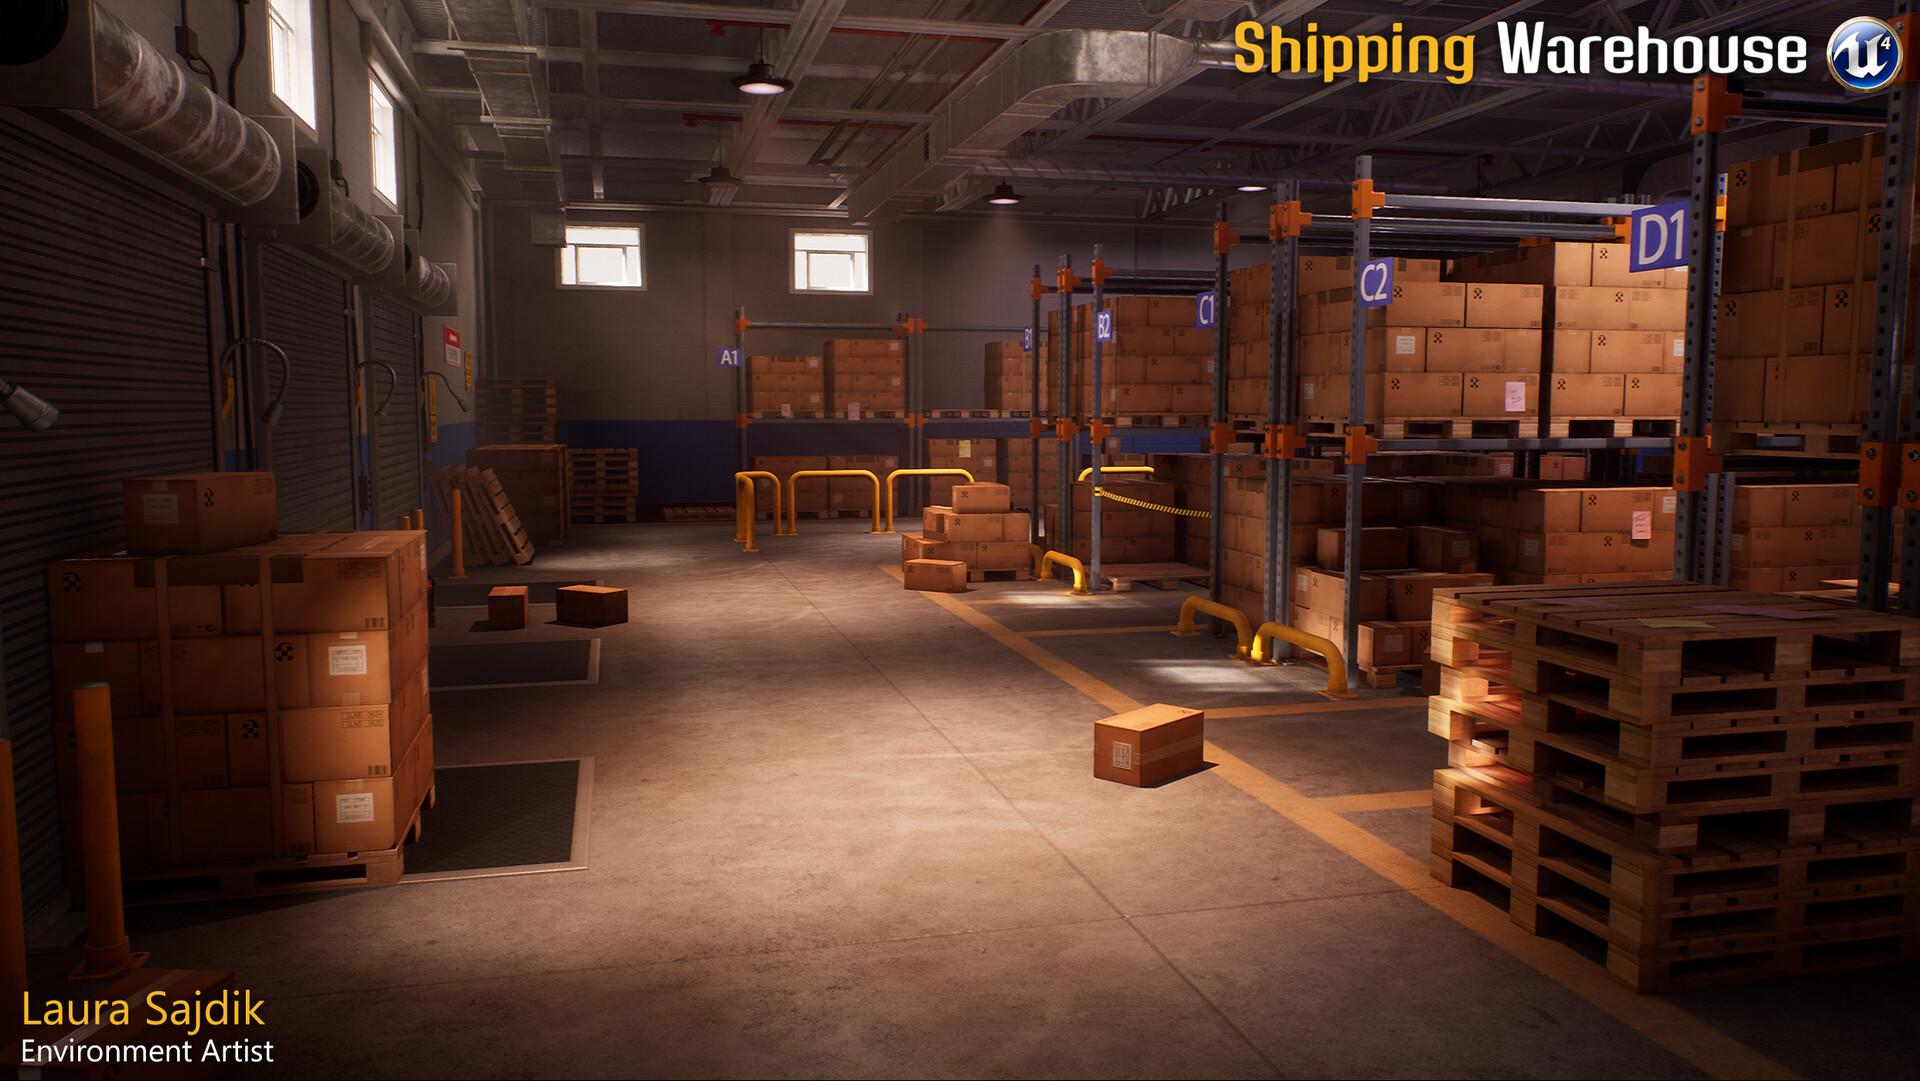 Laura sajdik laurasajdik warehouse02